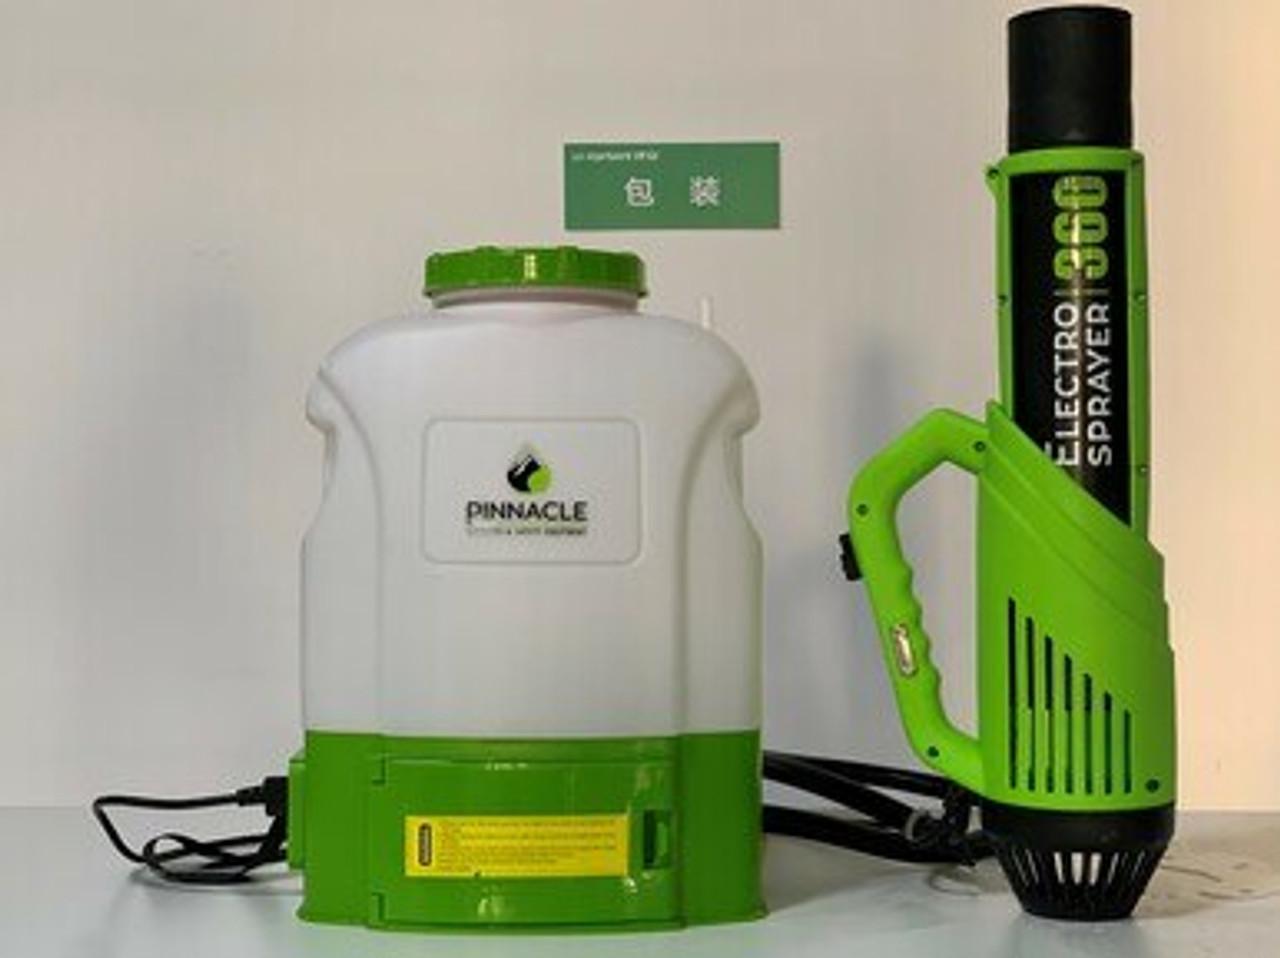 Pinnacle Electro-Static Sprayer 360